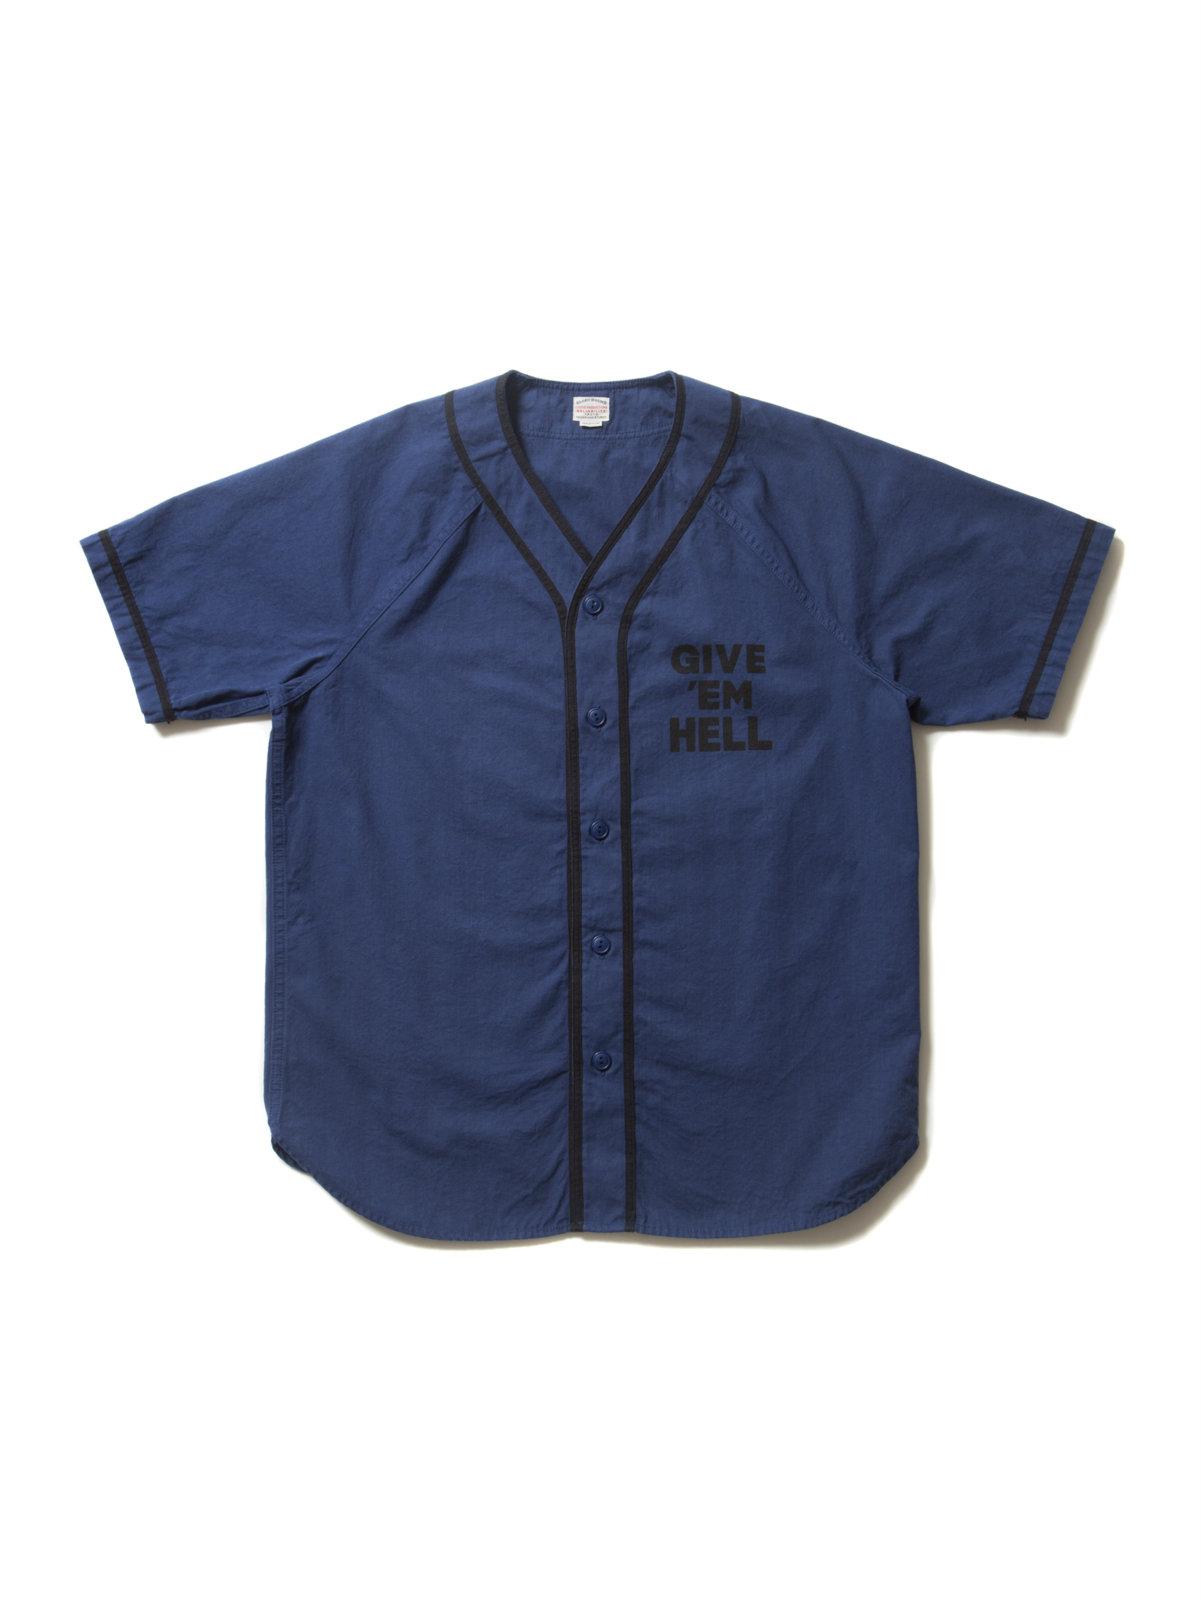 Ballgame Shirt-Blue-